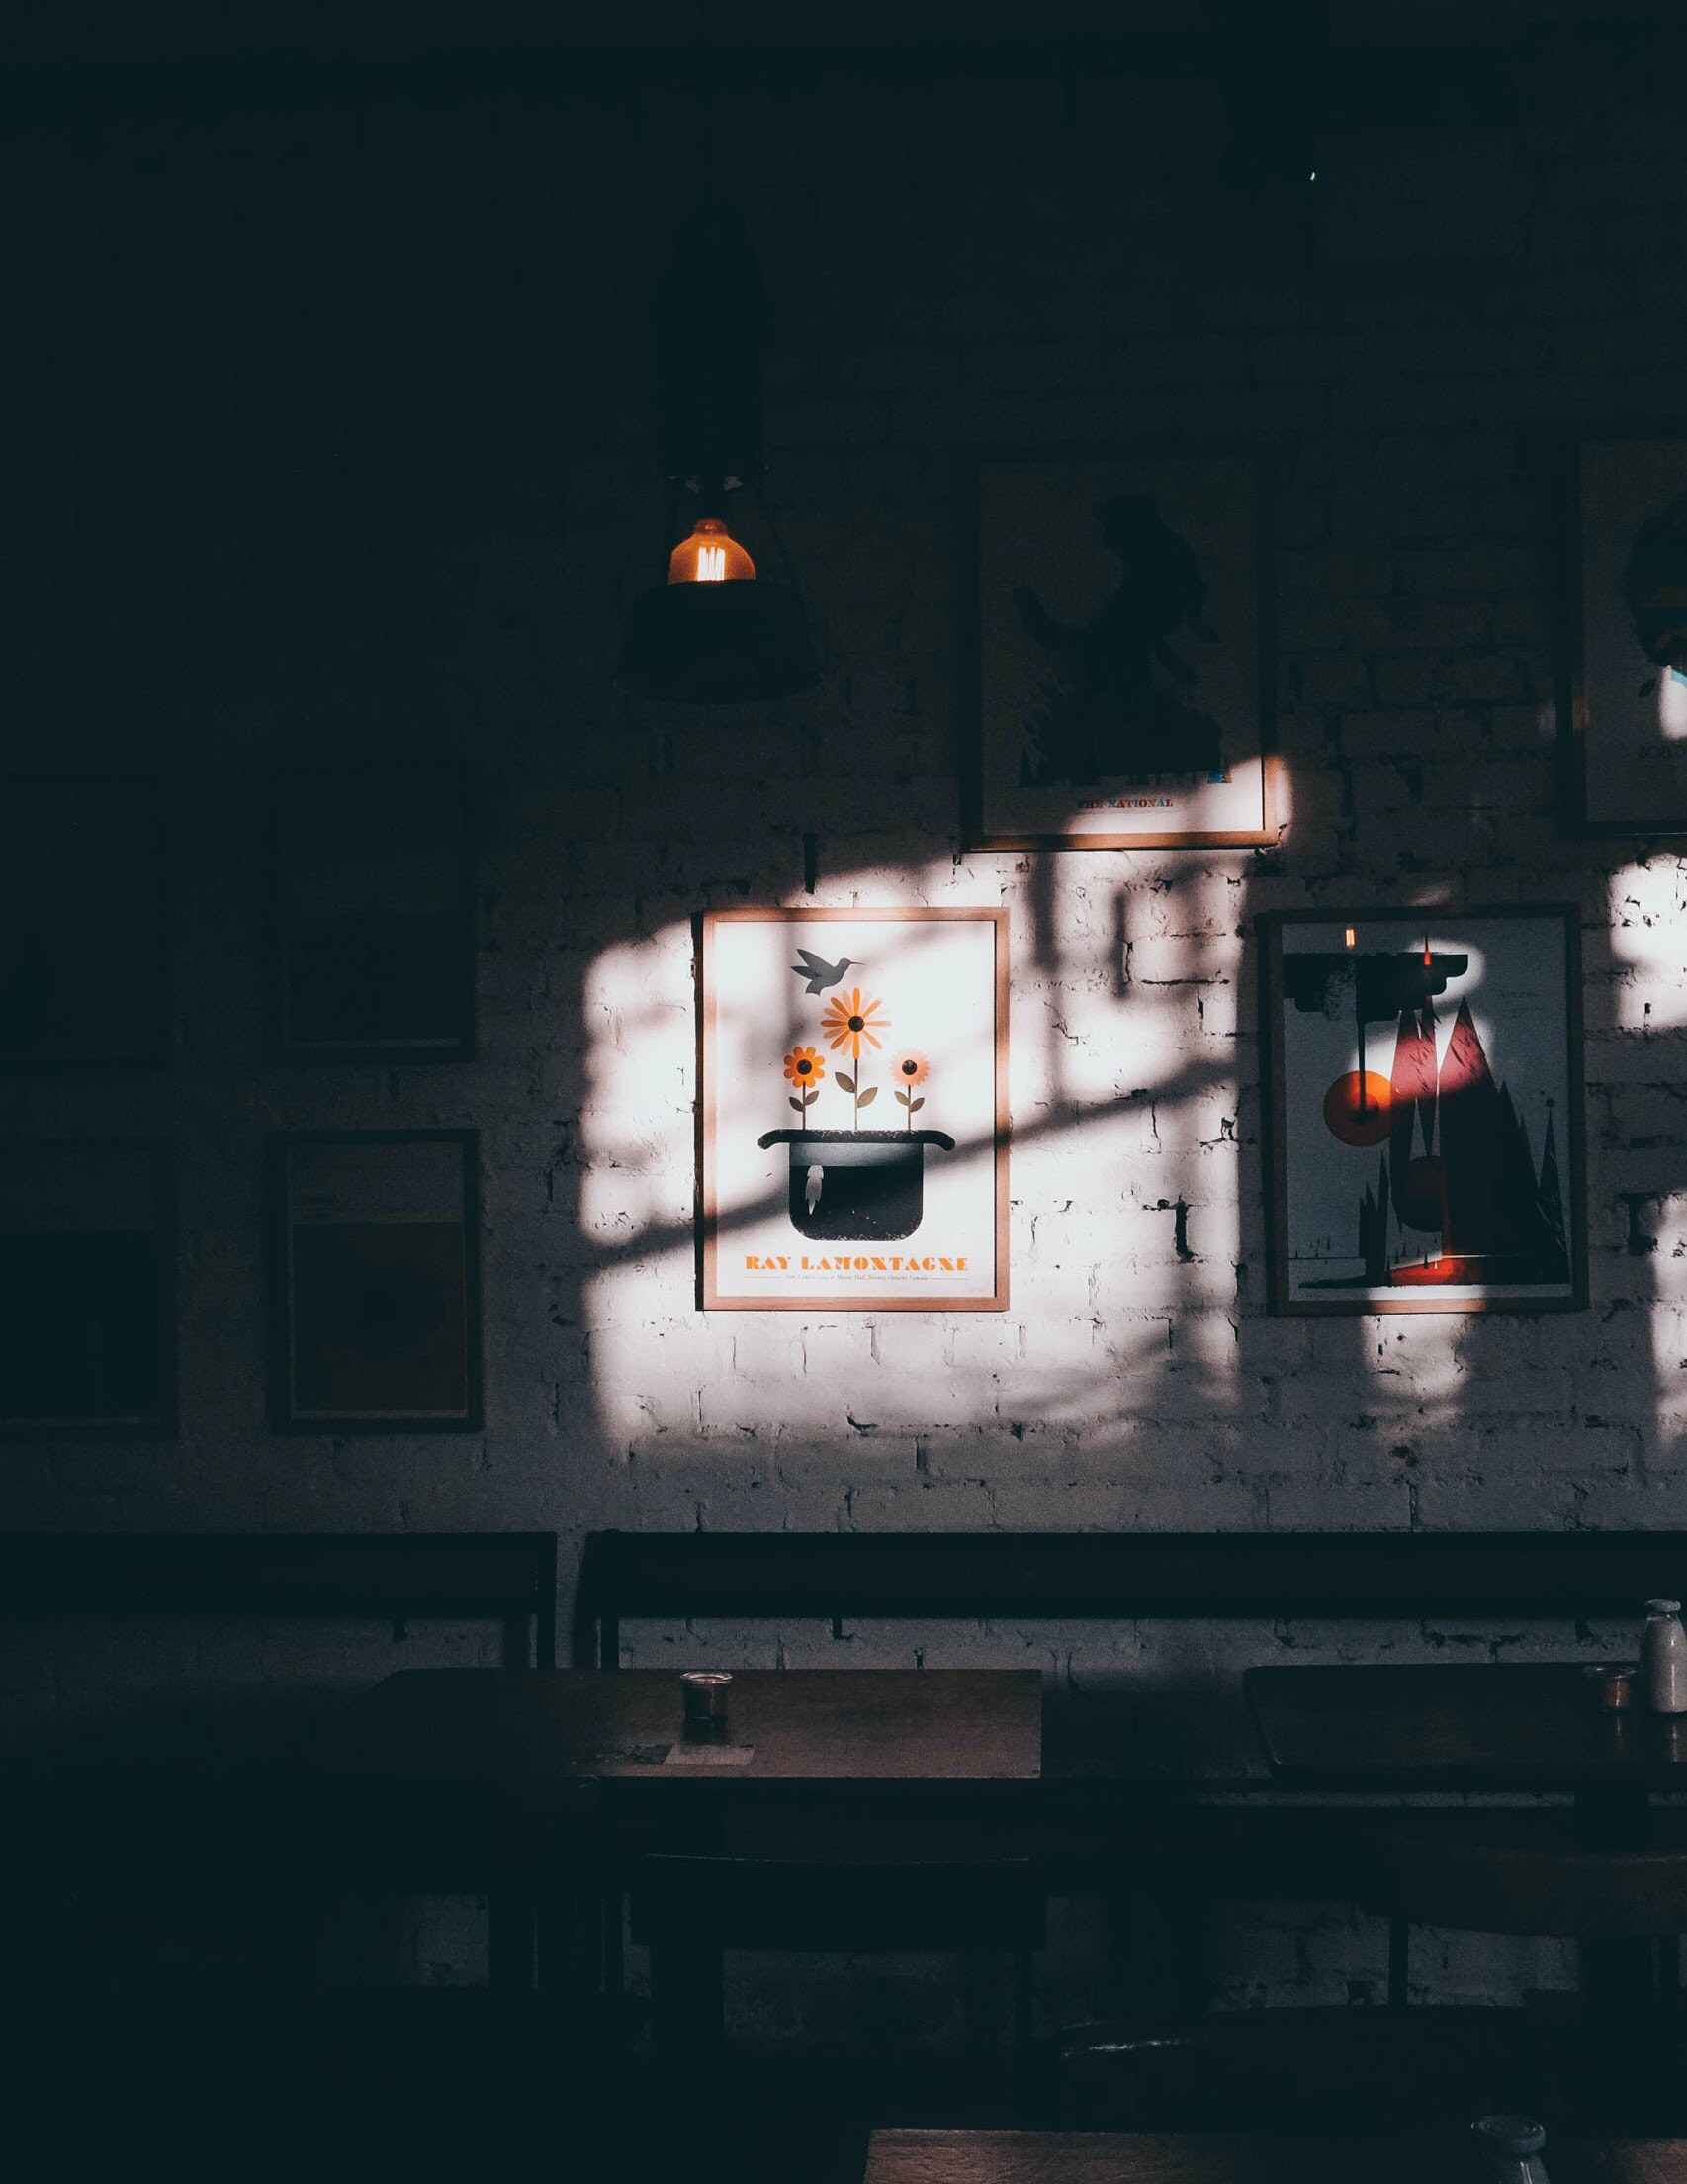 lights casting on photo frames in dark room